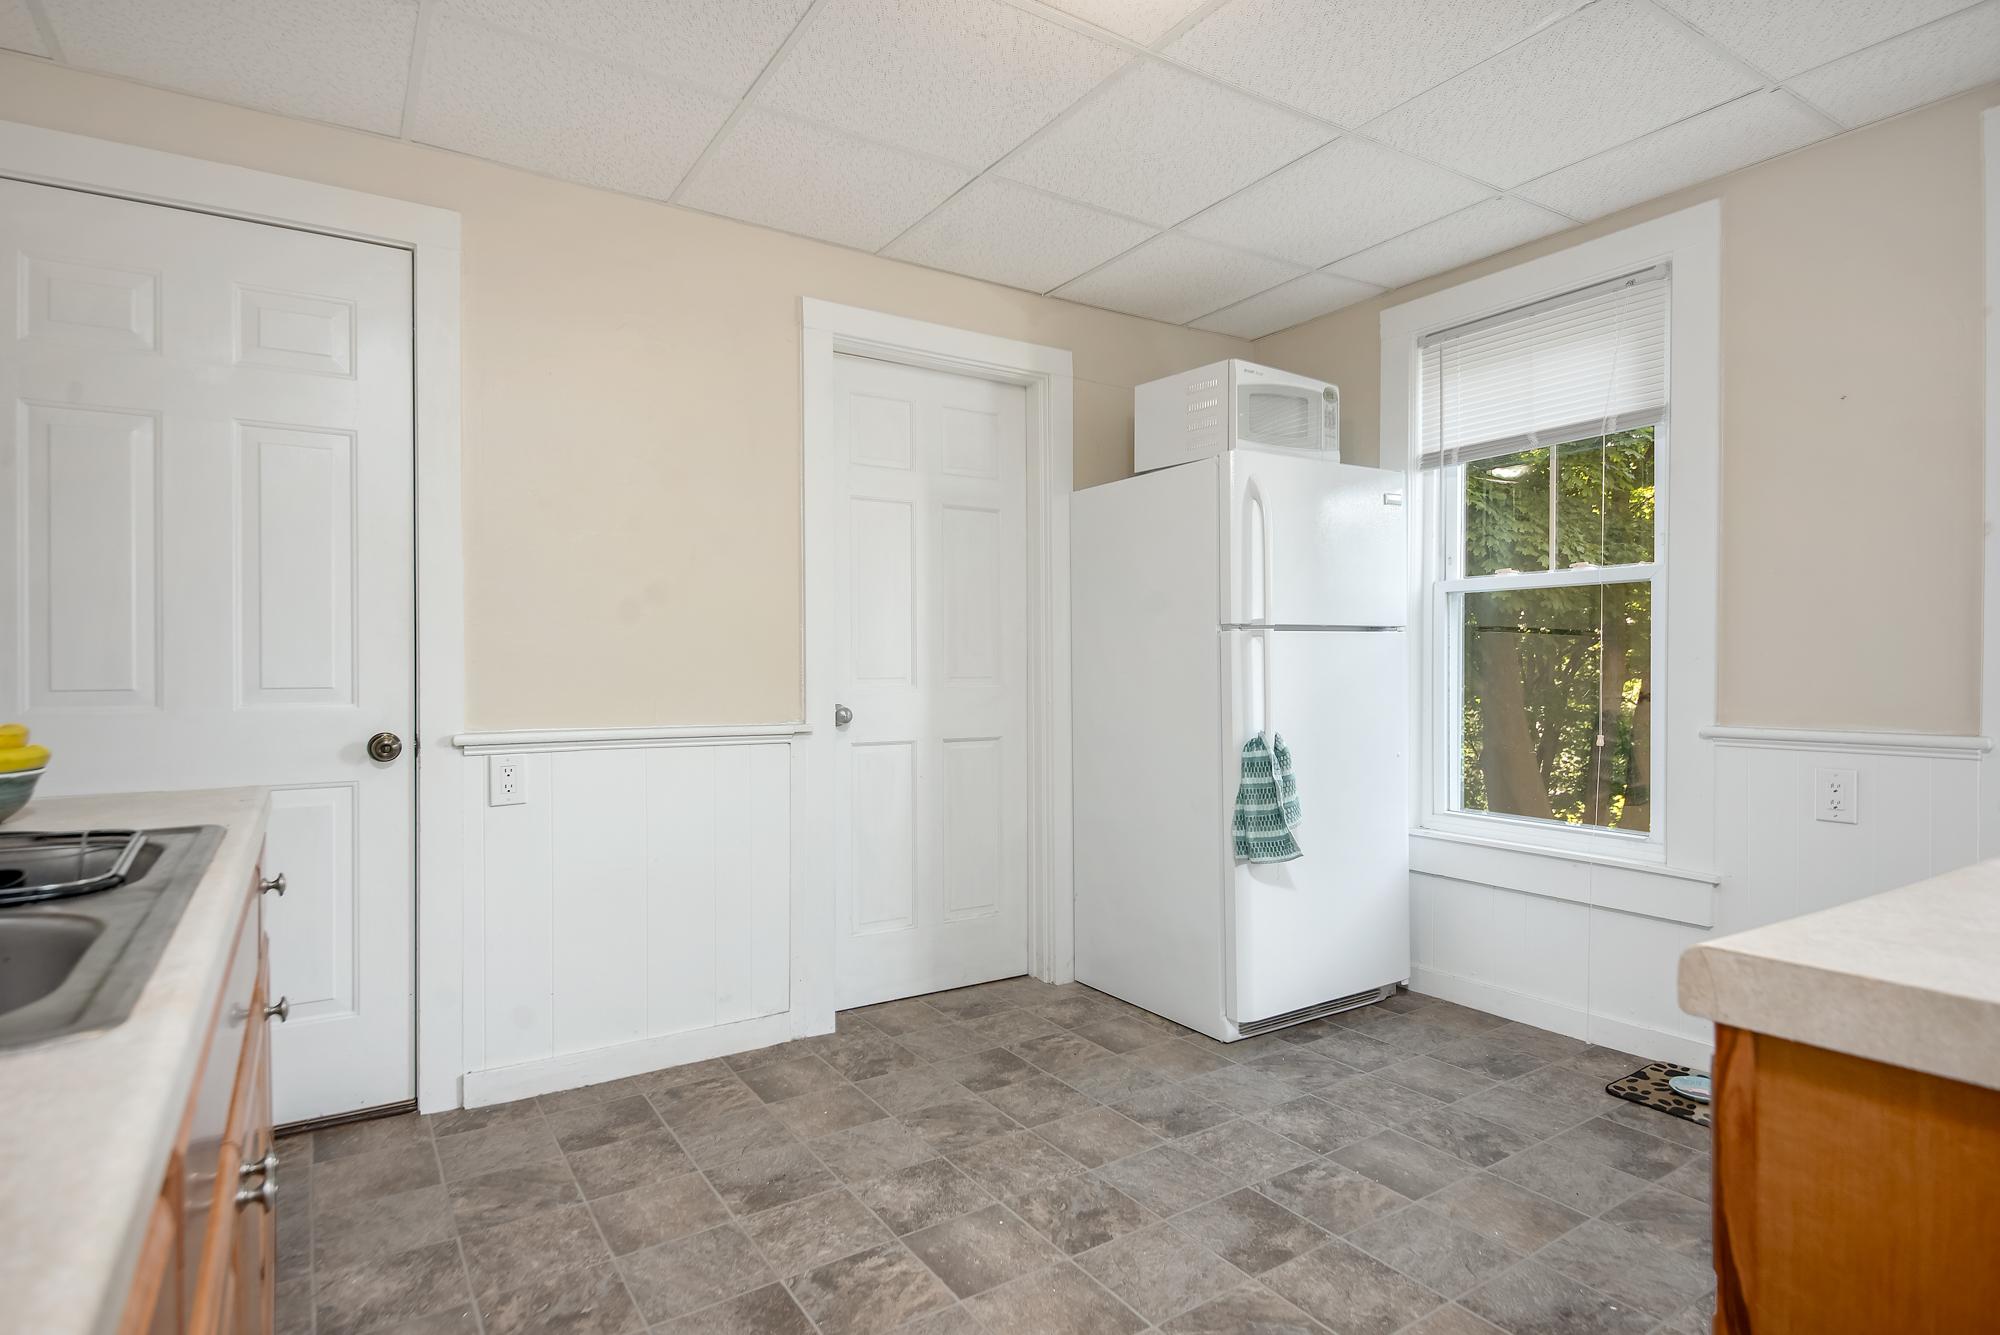 51-53 Prospect-kitchen 12.jpg